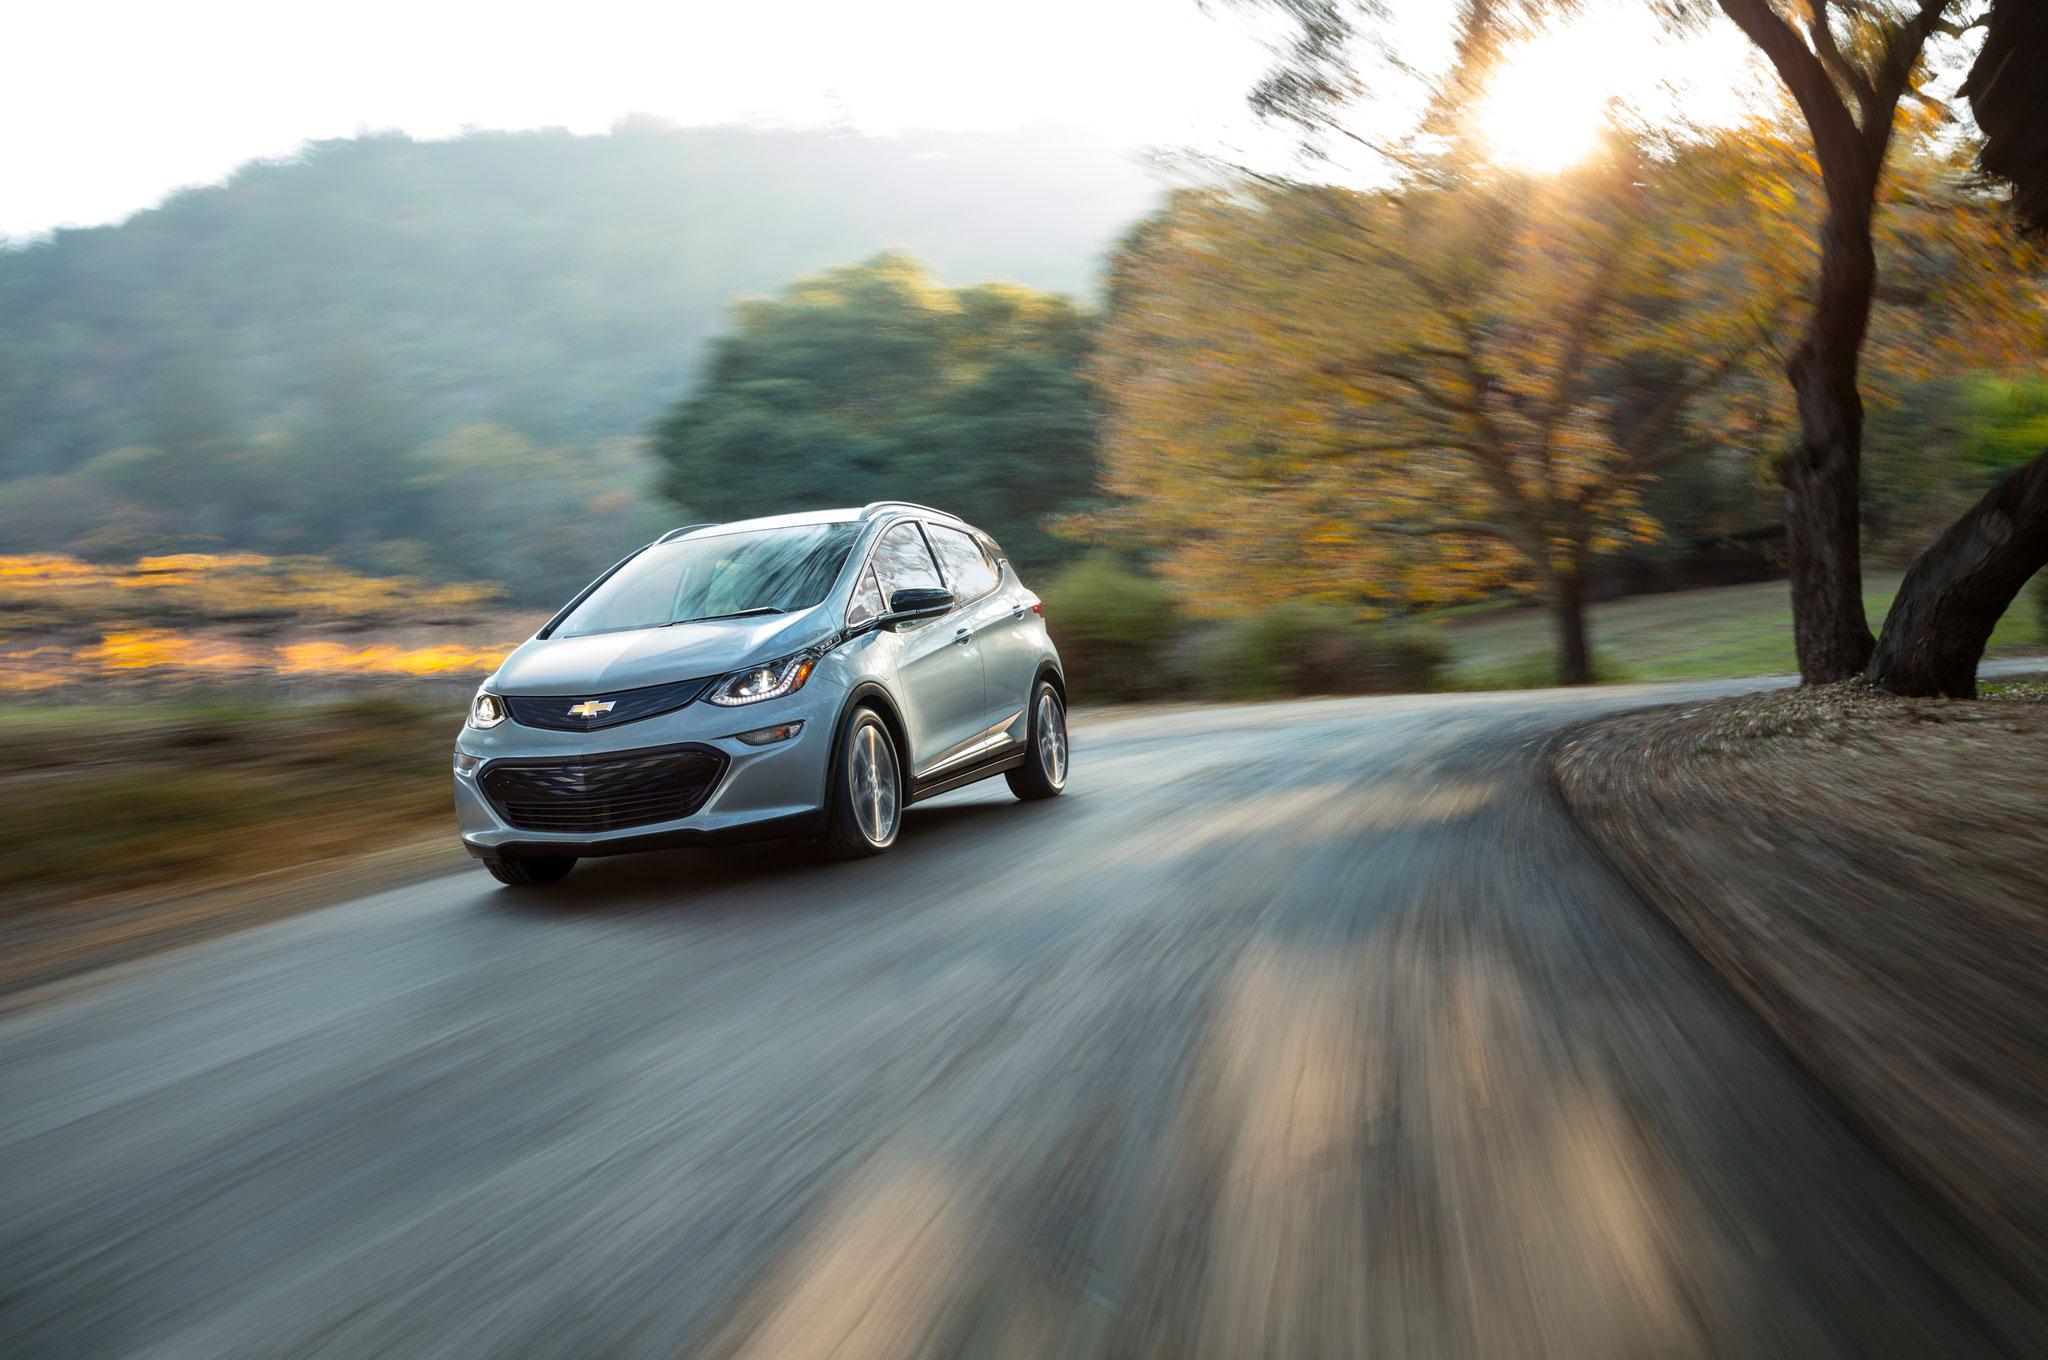 2017 Chevrolet Bolt EV In Motion 1